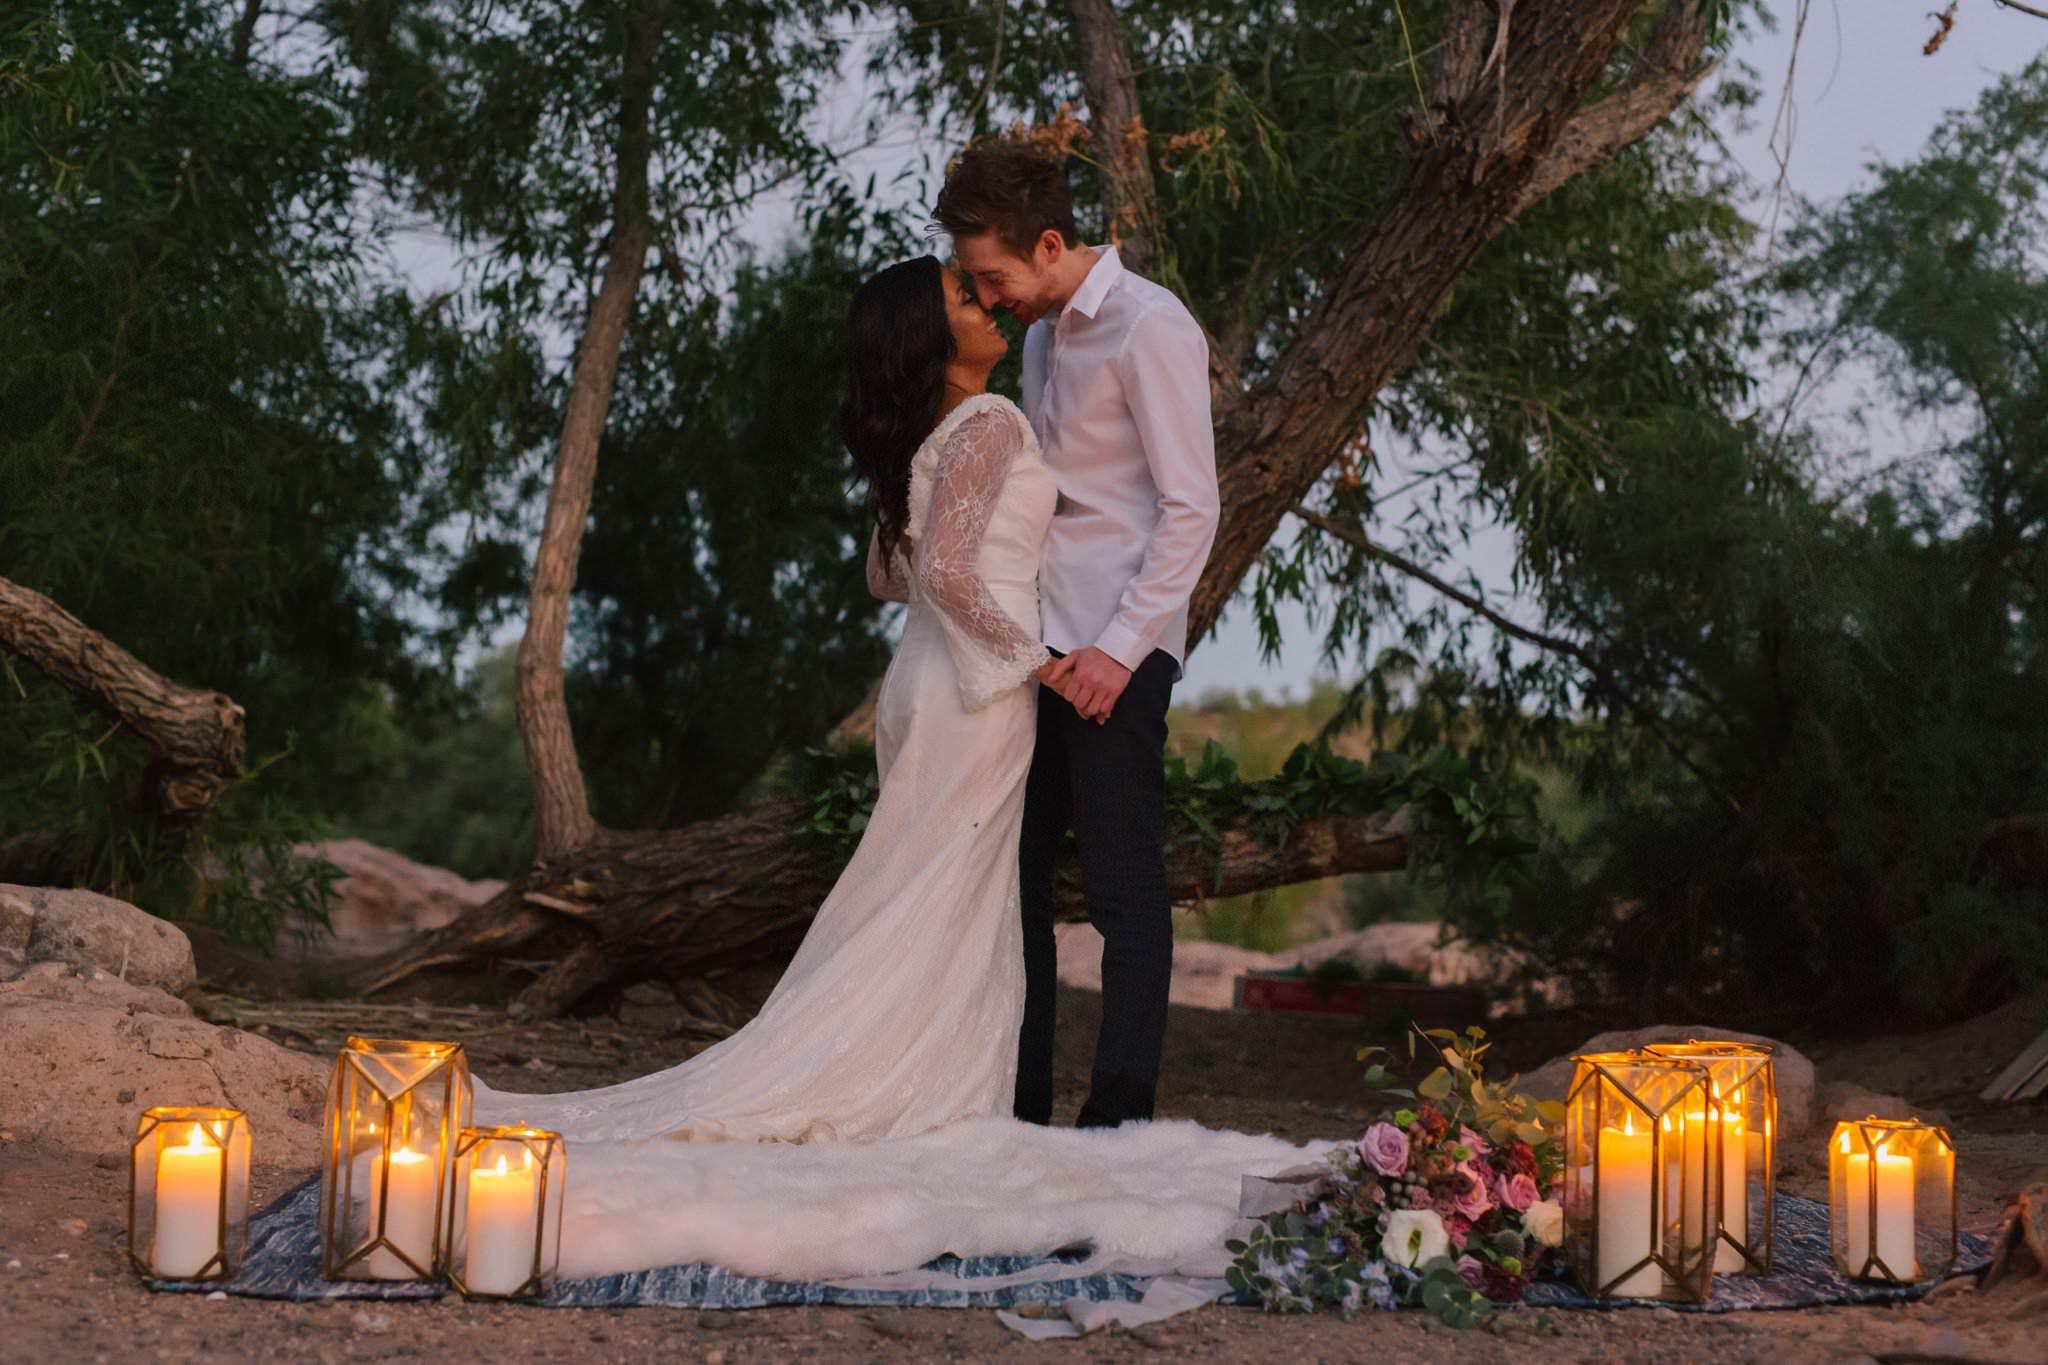 romantic candlelit dusk elopement at Arizona Salt River